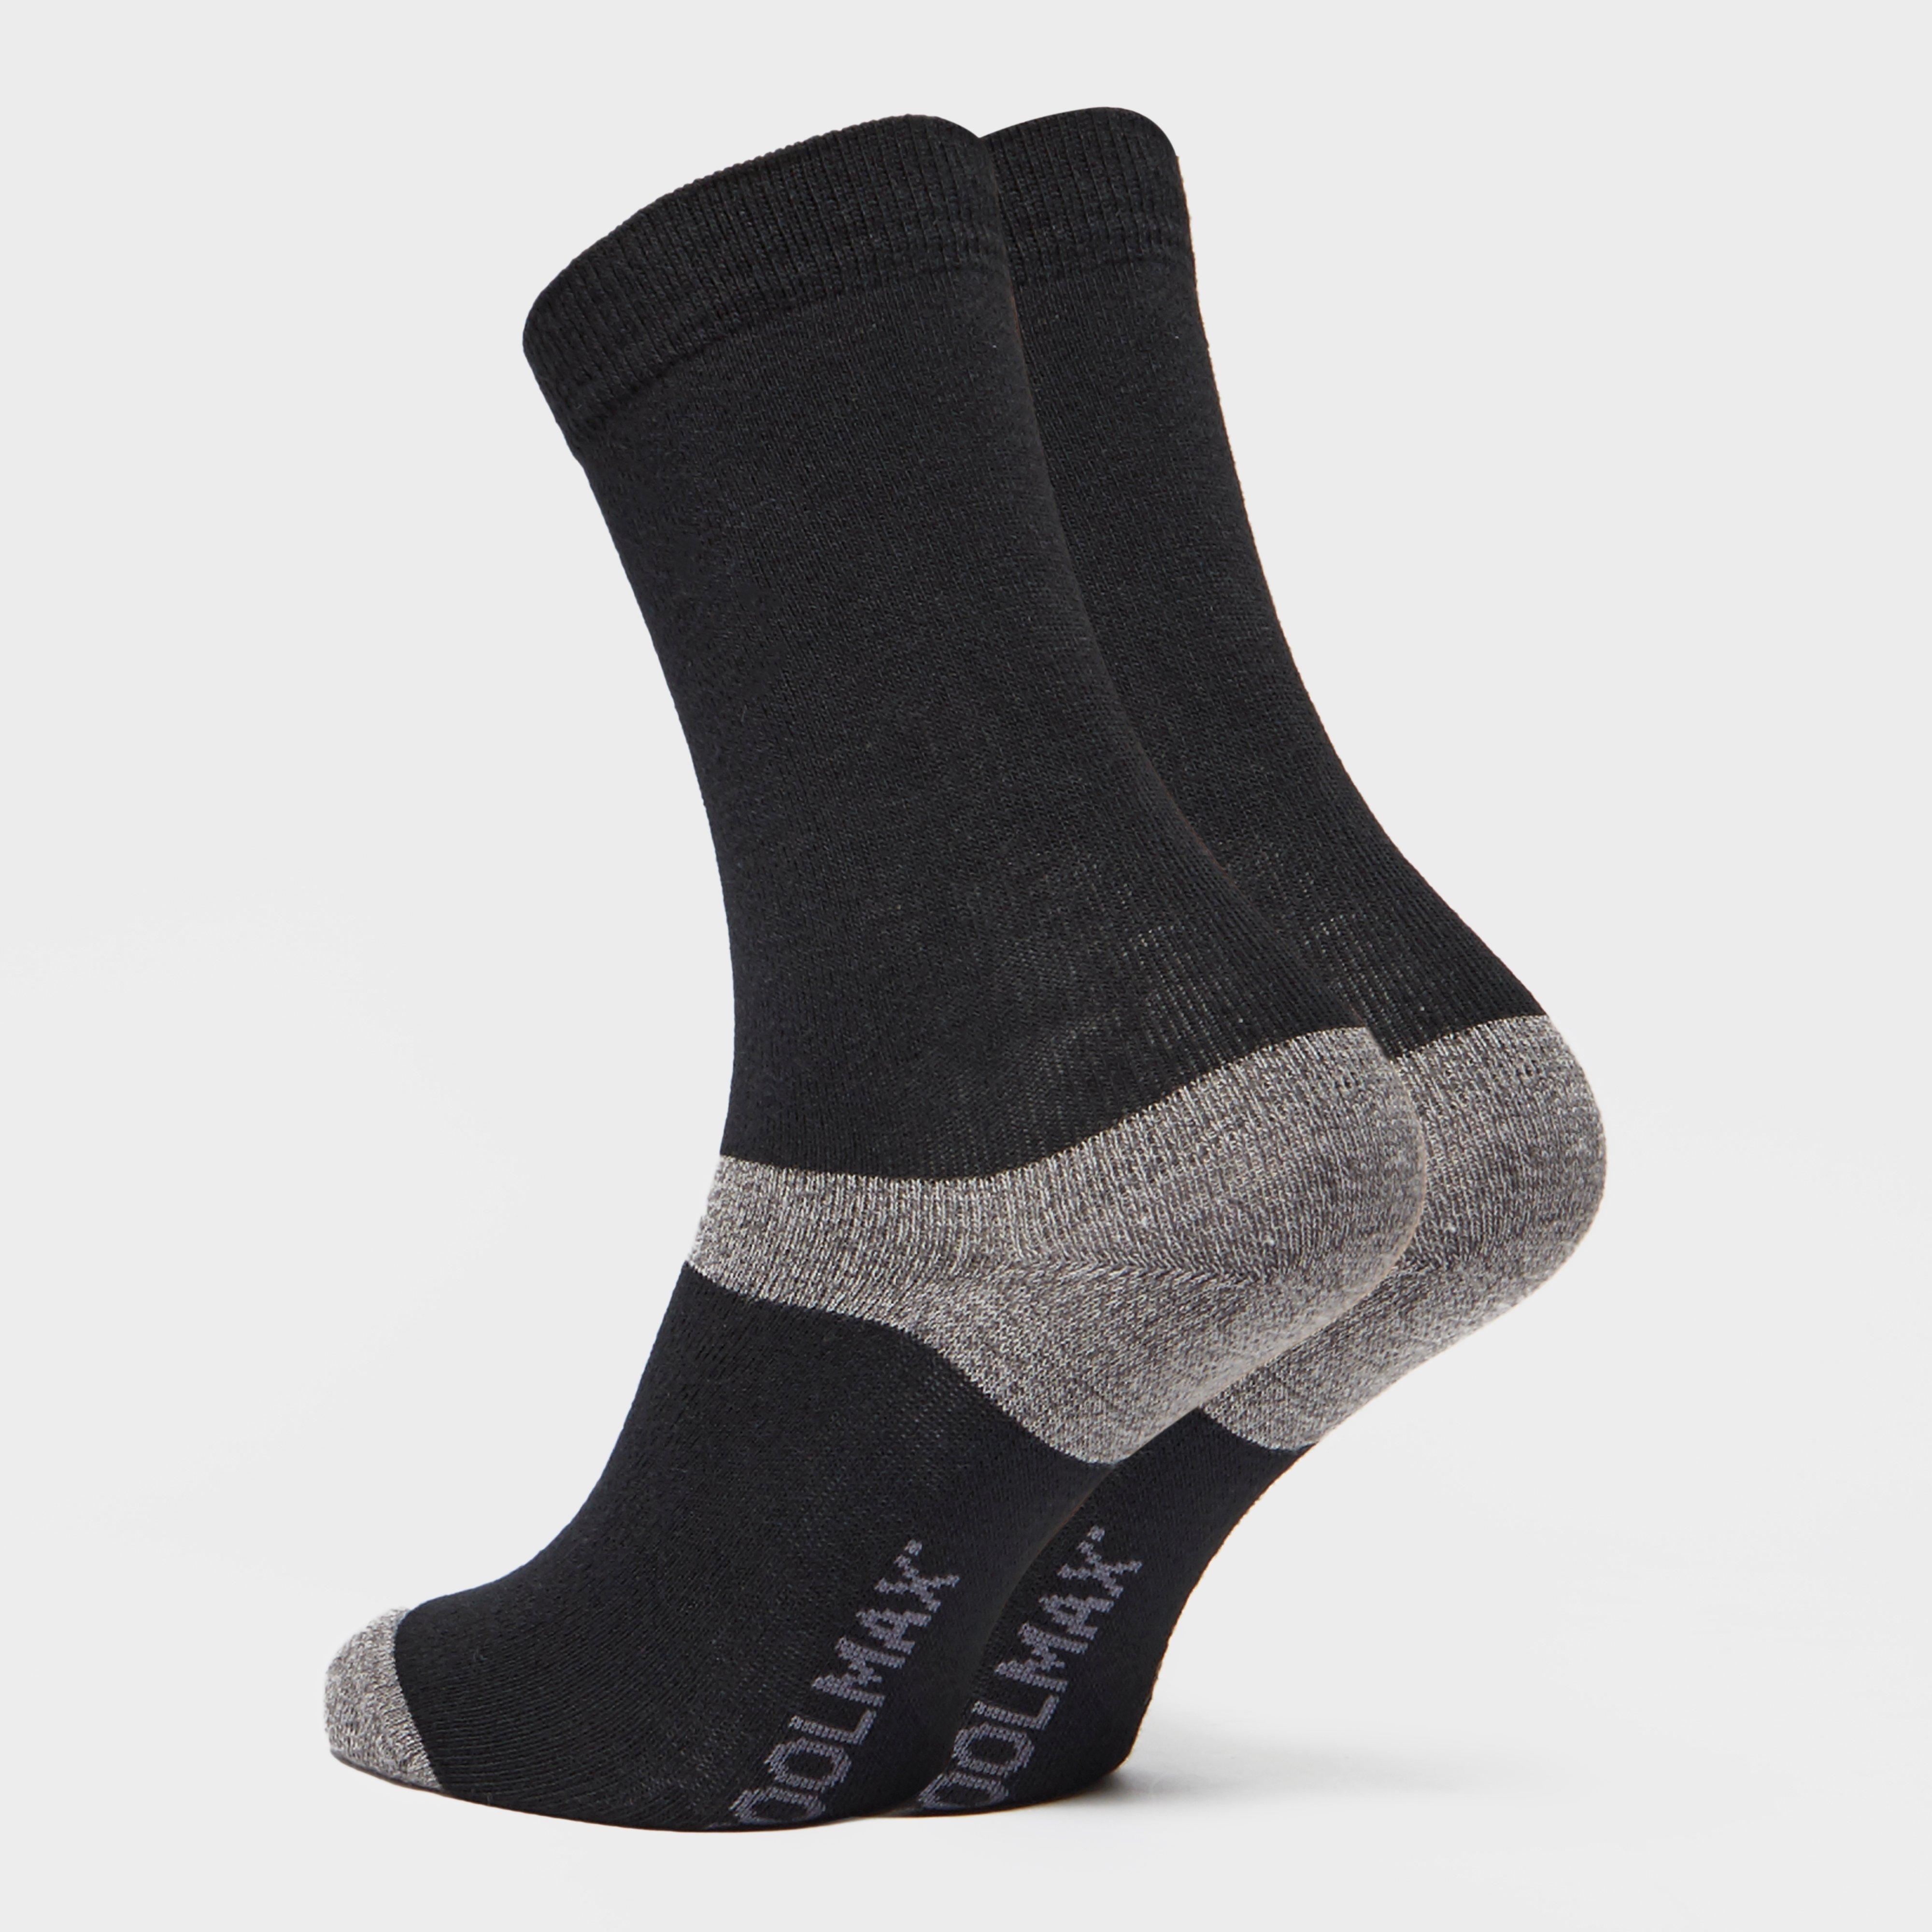 Peter Storm Multi active Coolmax Liner Sock  Womens Size Medium 6-8   2 Pair